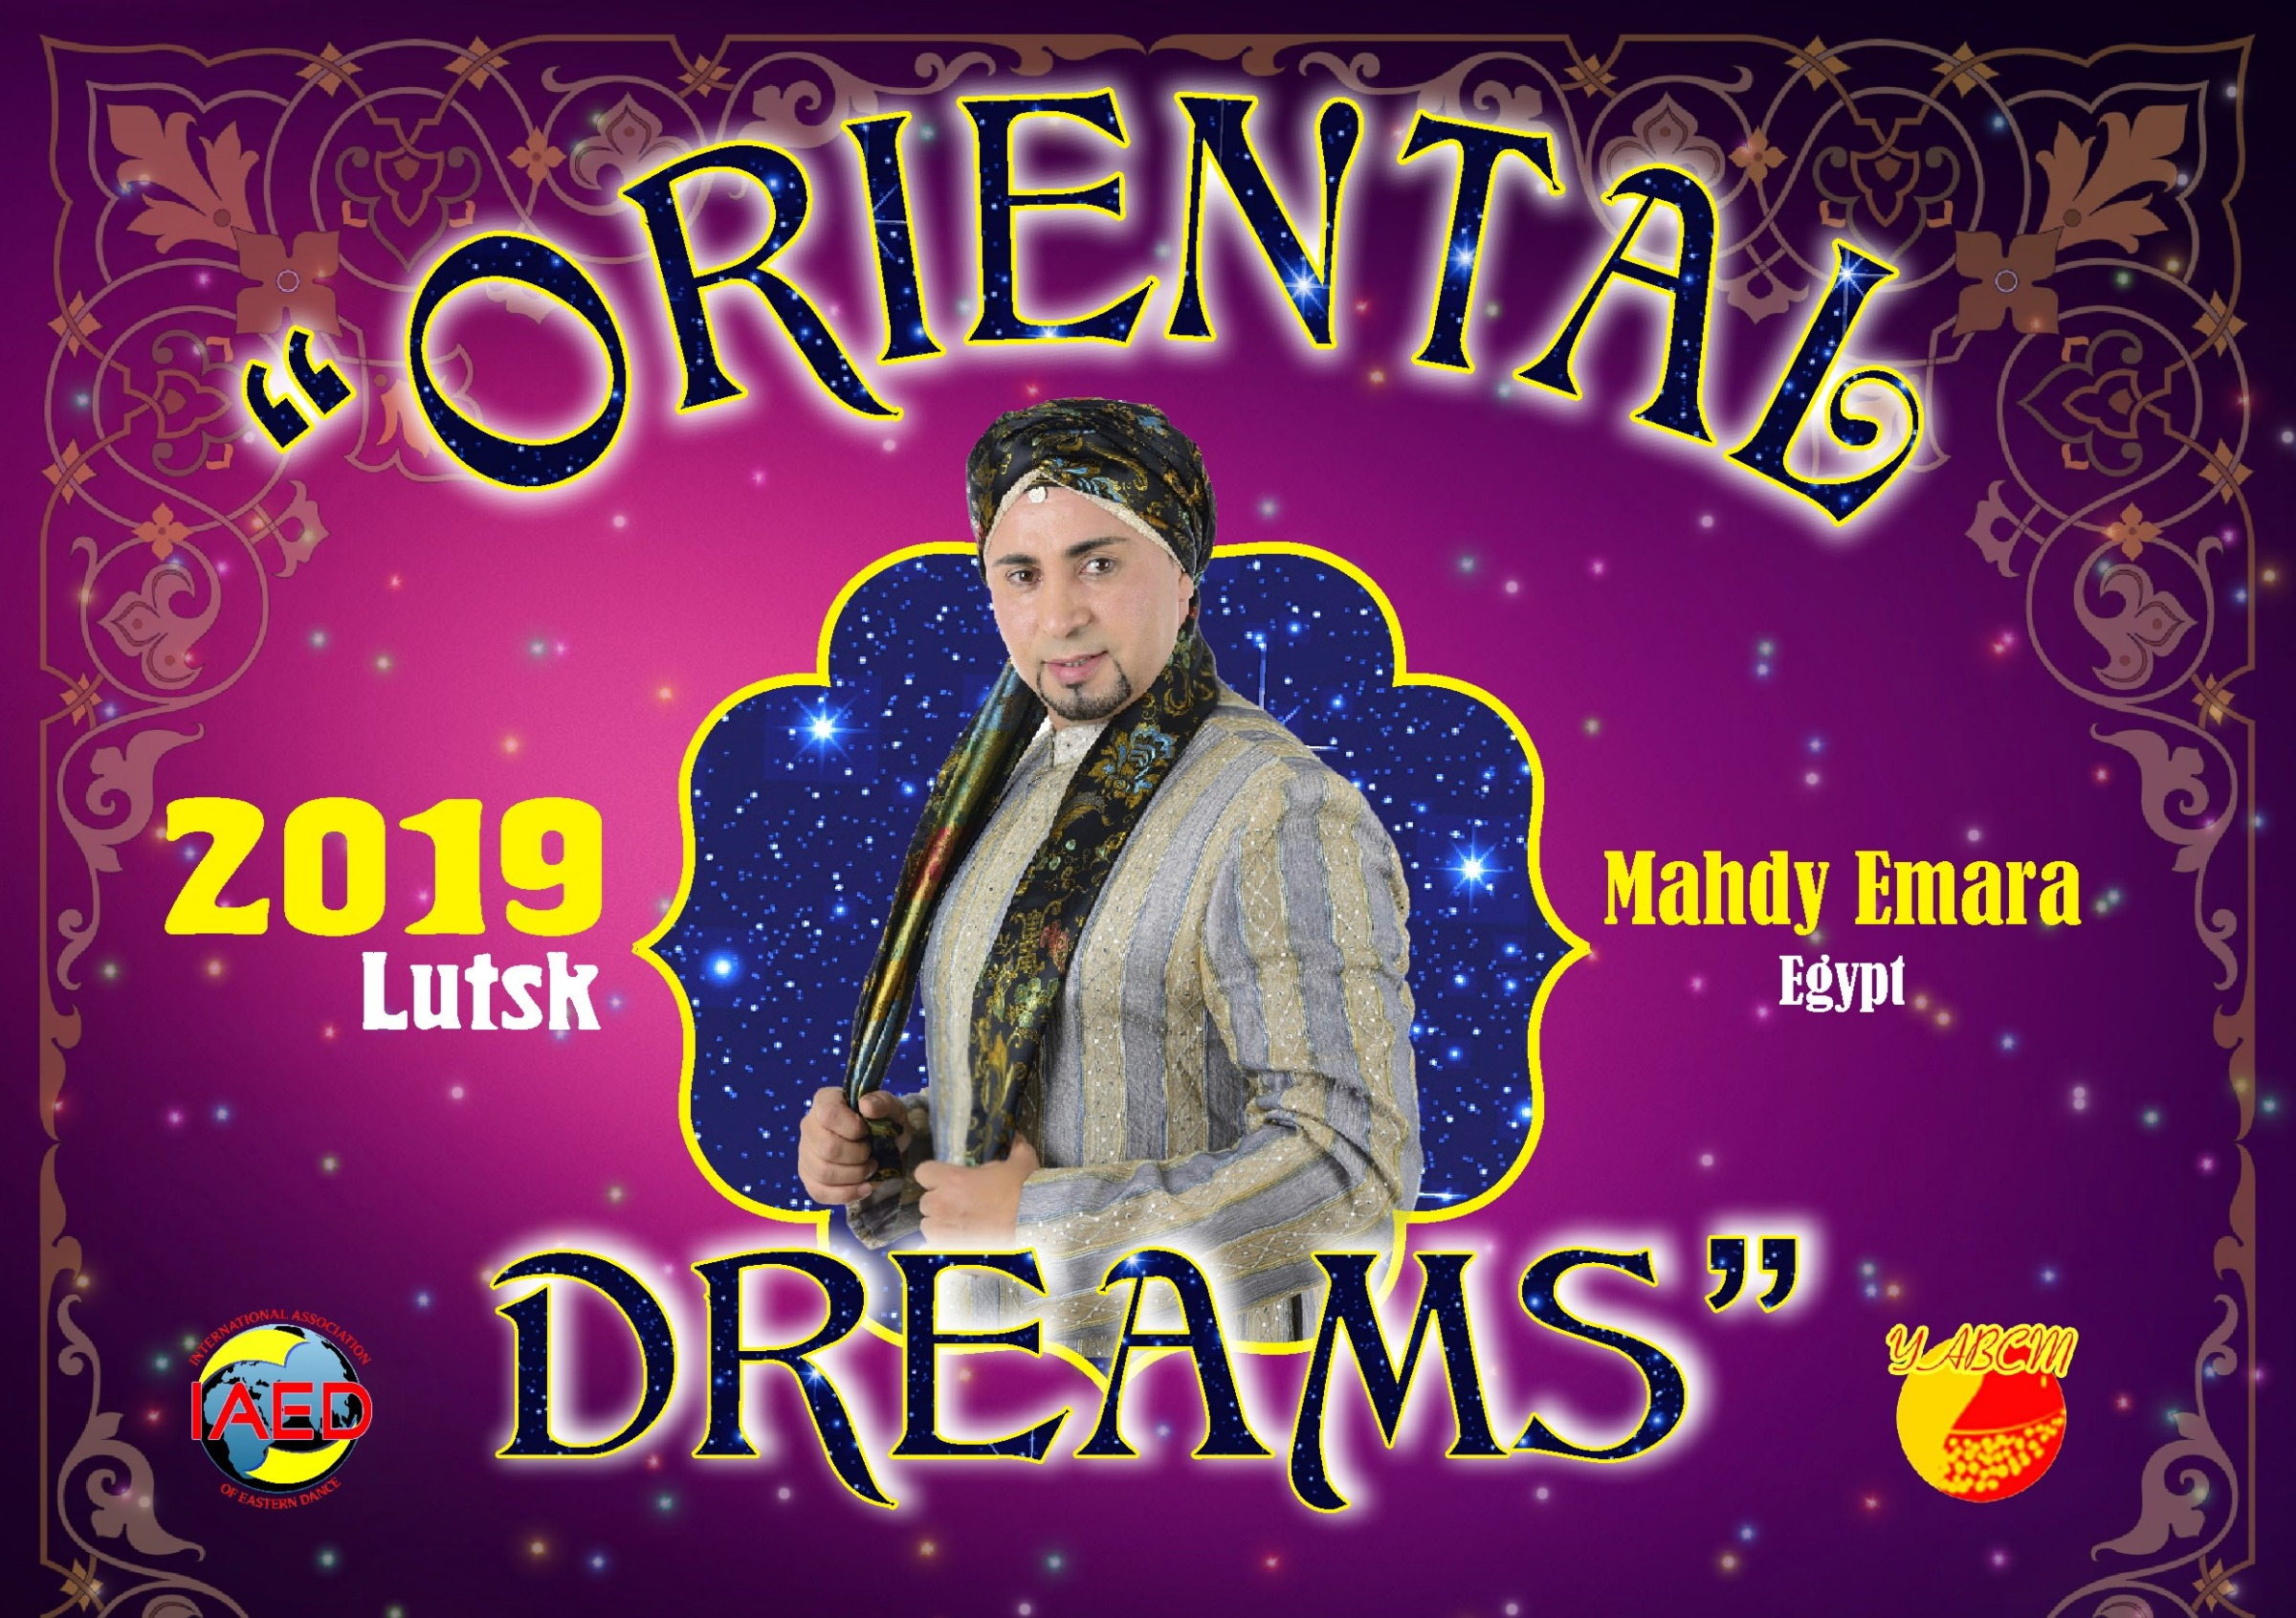 Oriental_Dreams_Mahdy_2019-09-14.jpg